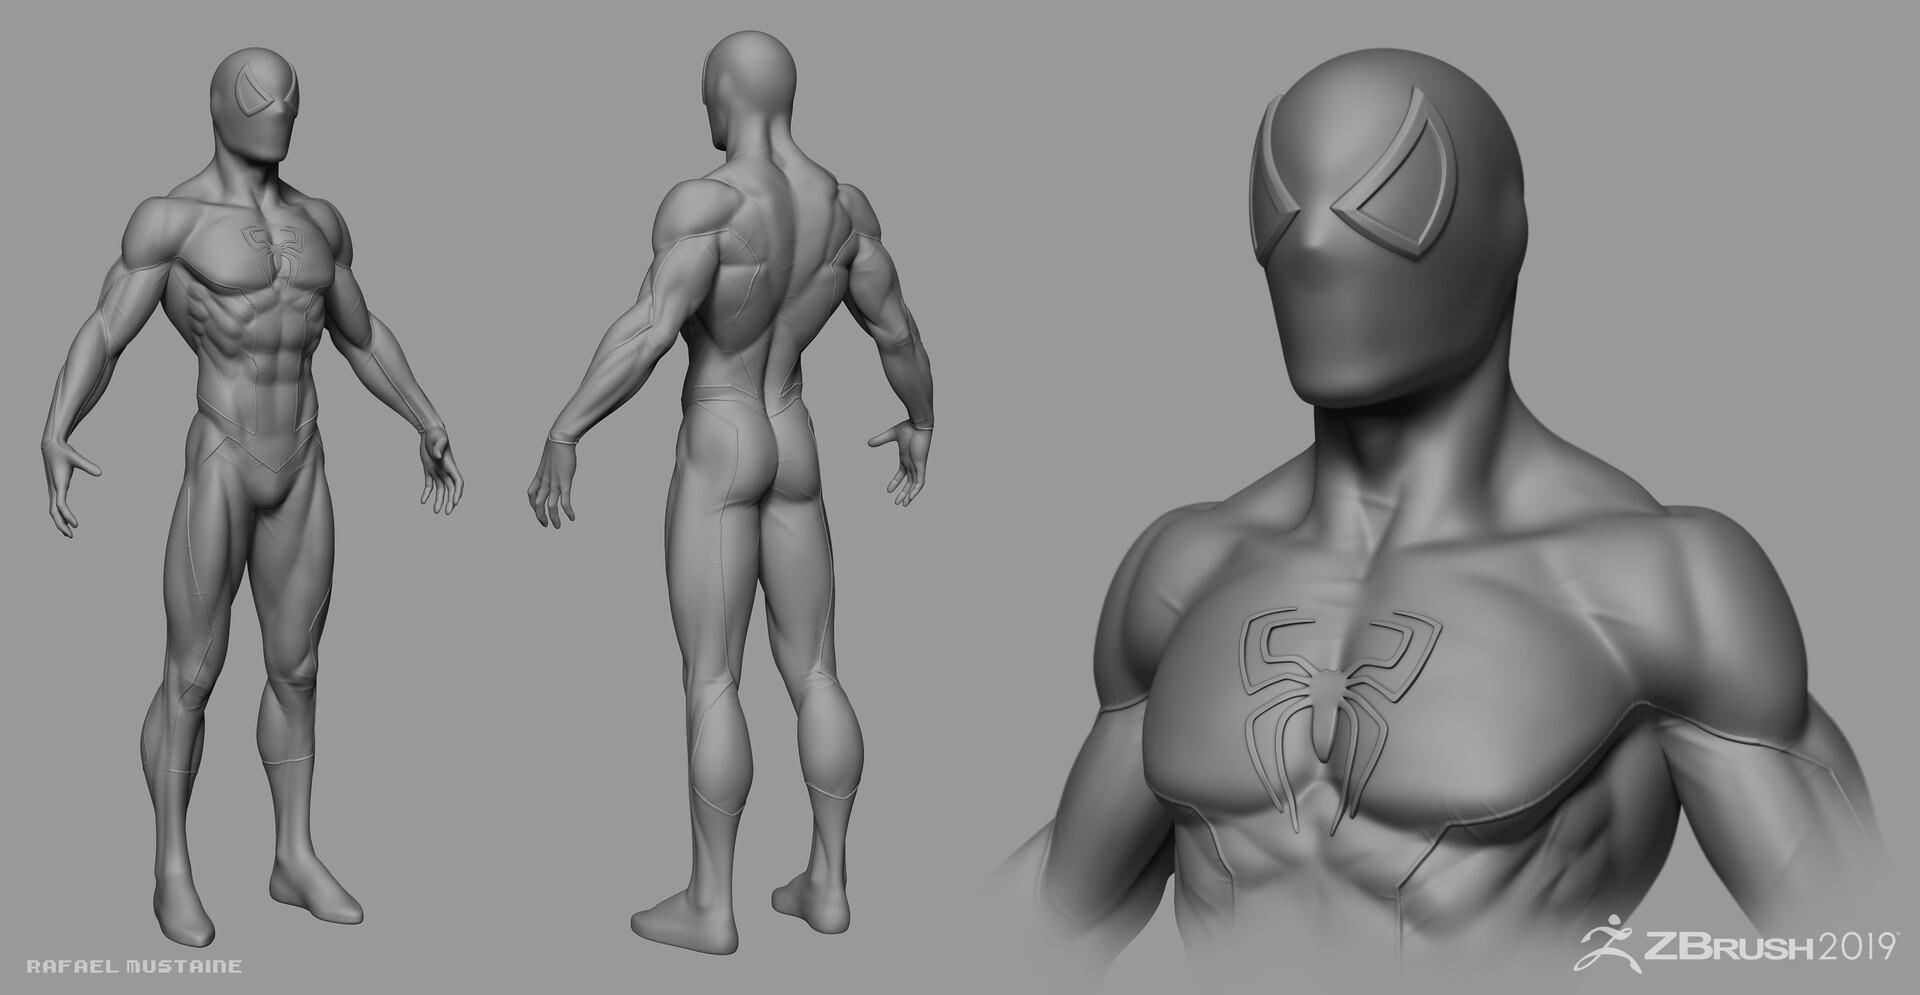 Spider-Man Zbrush